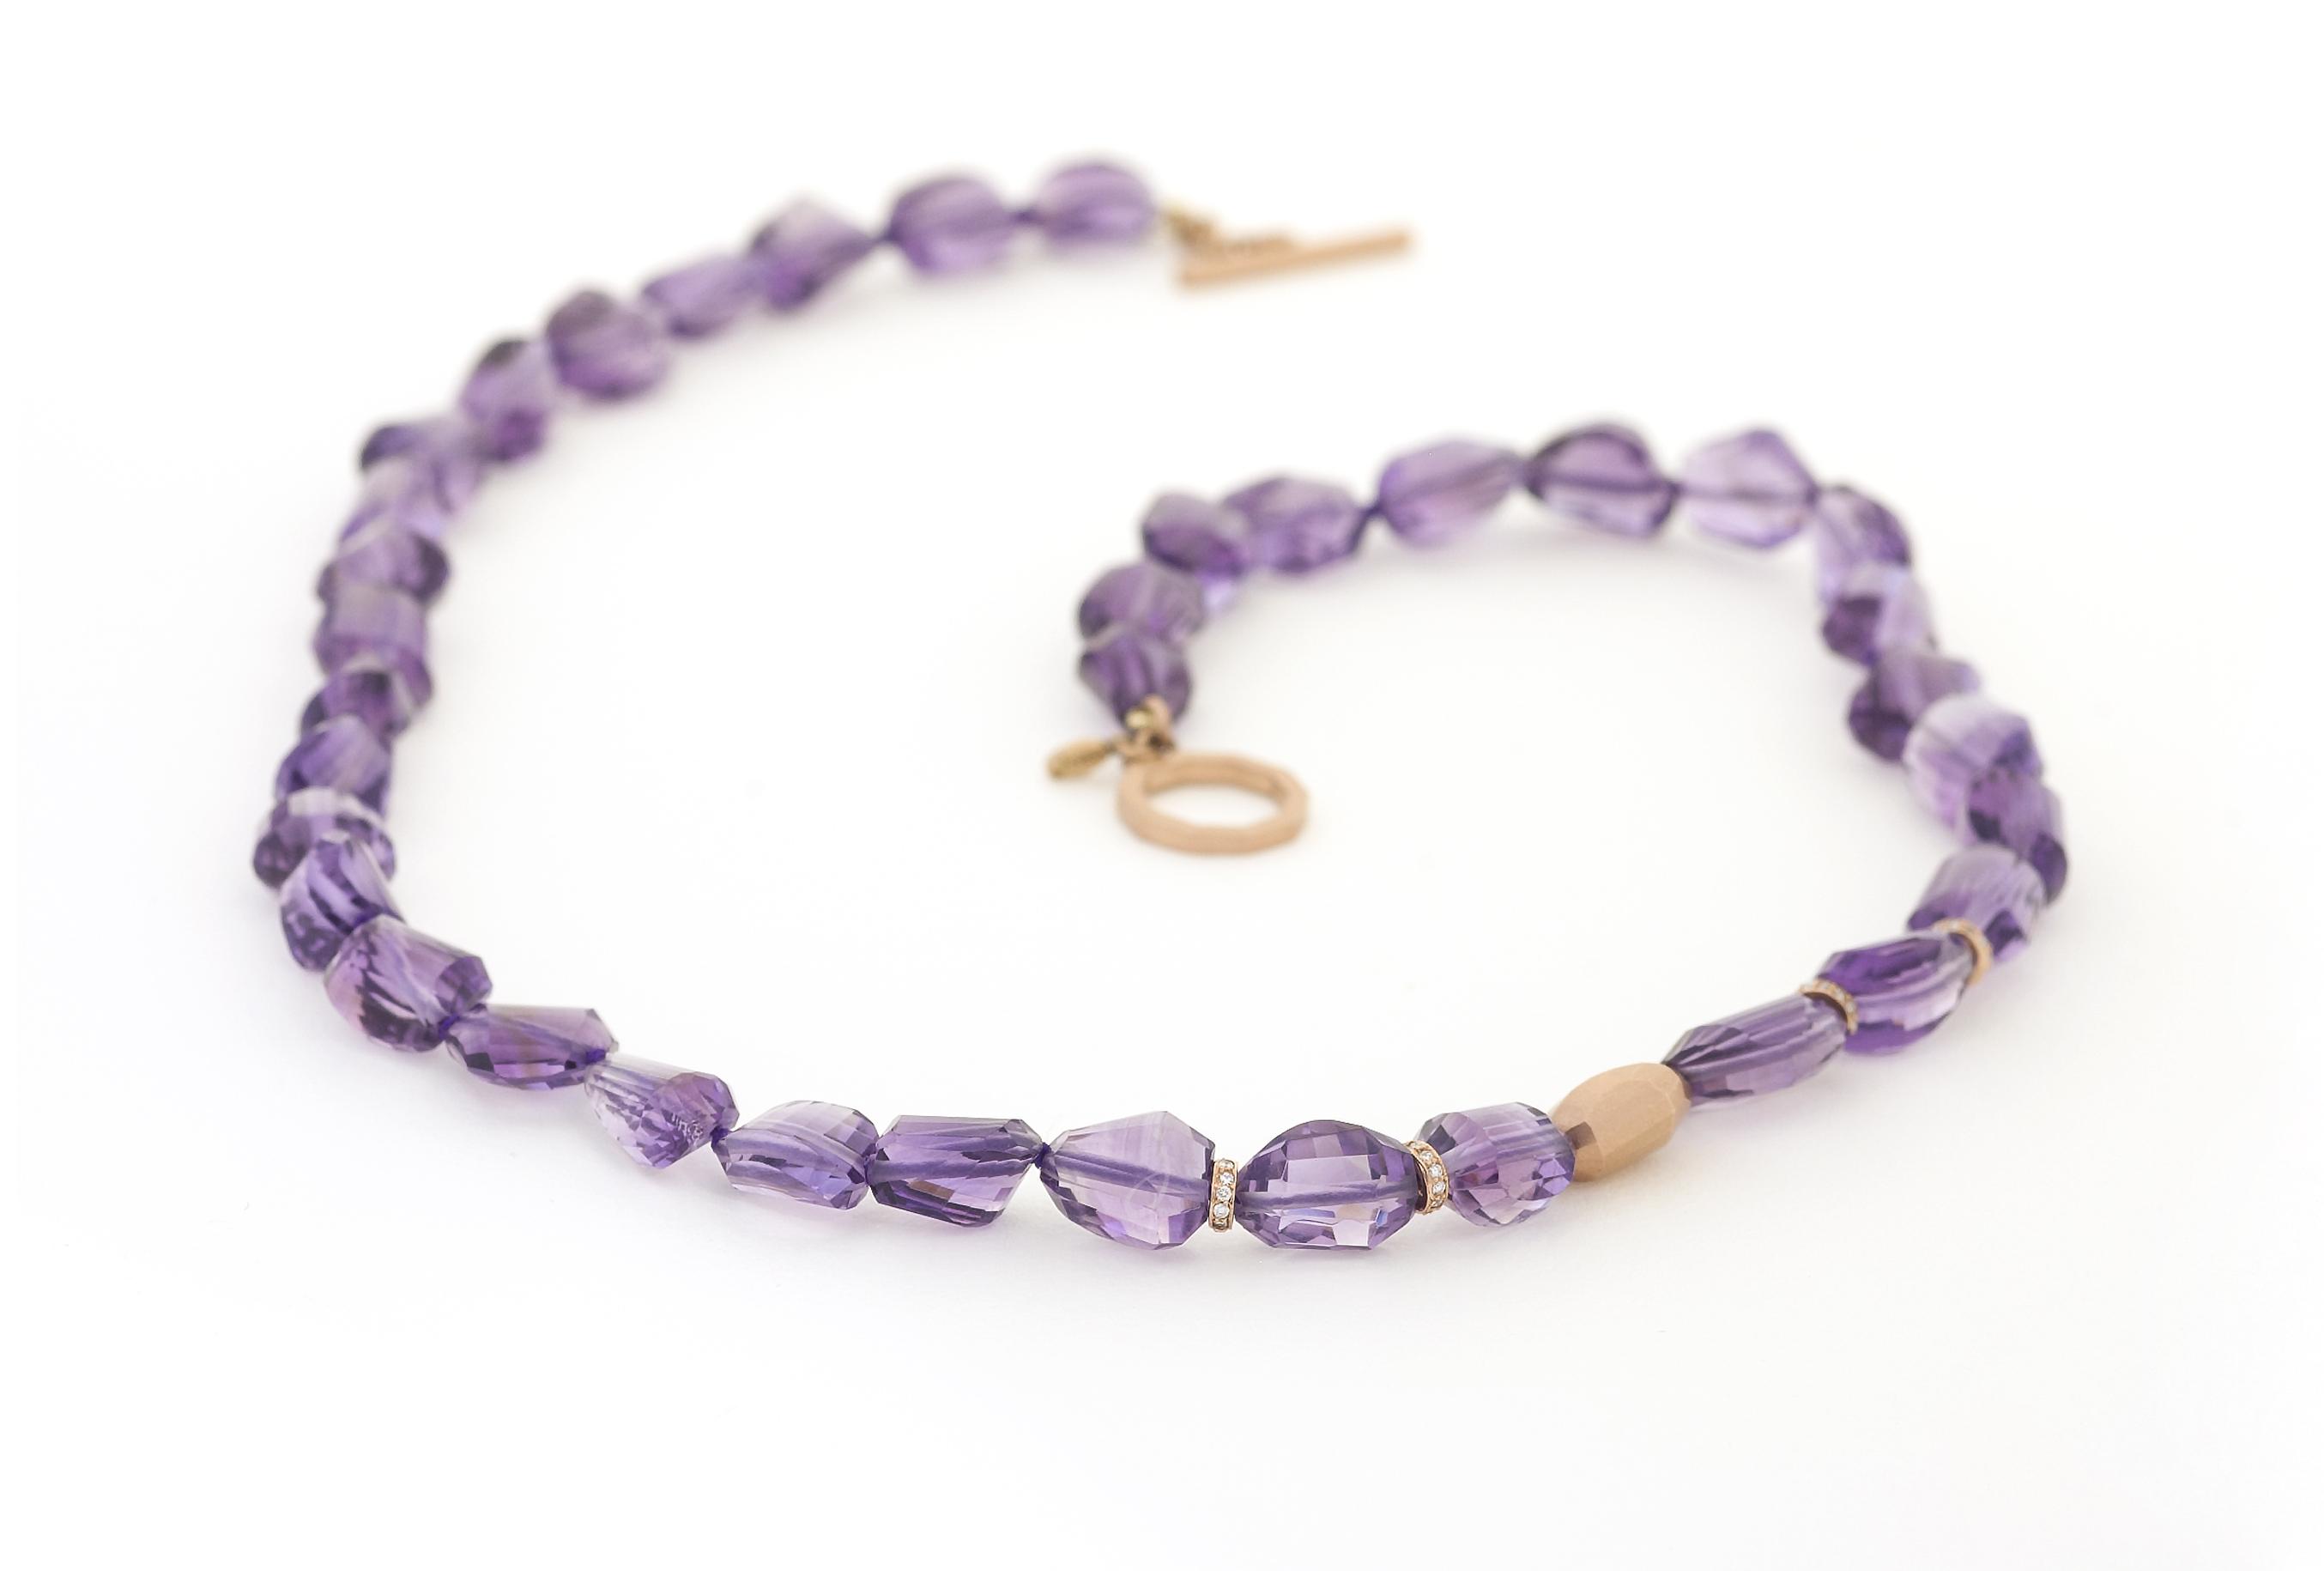 Amythest and Diamond necklace